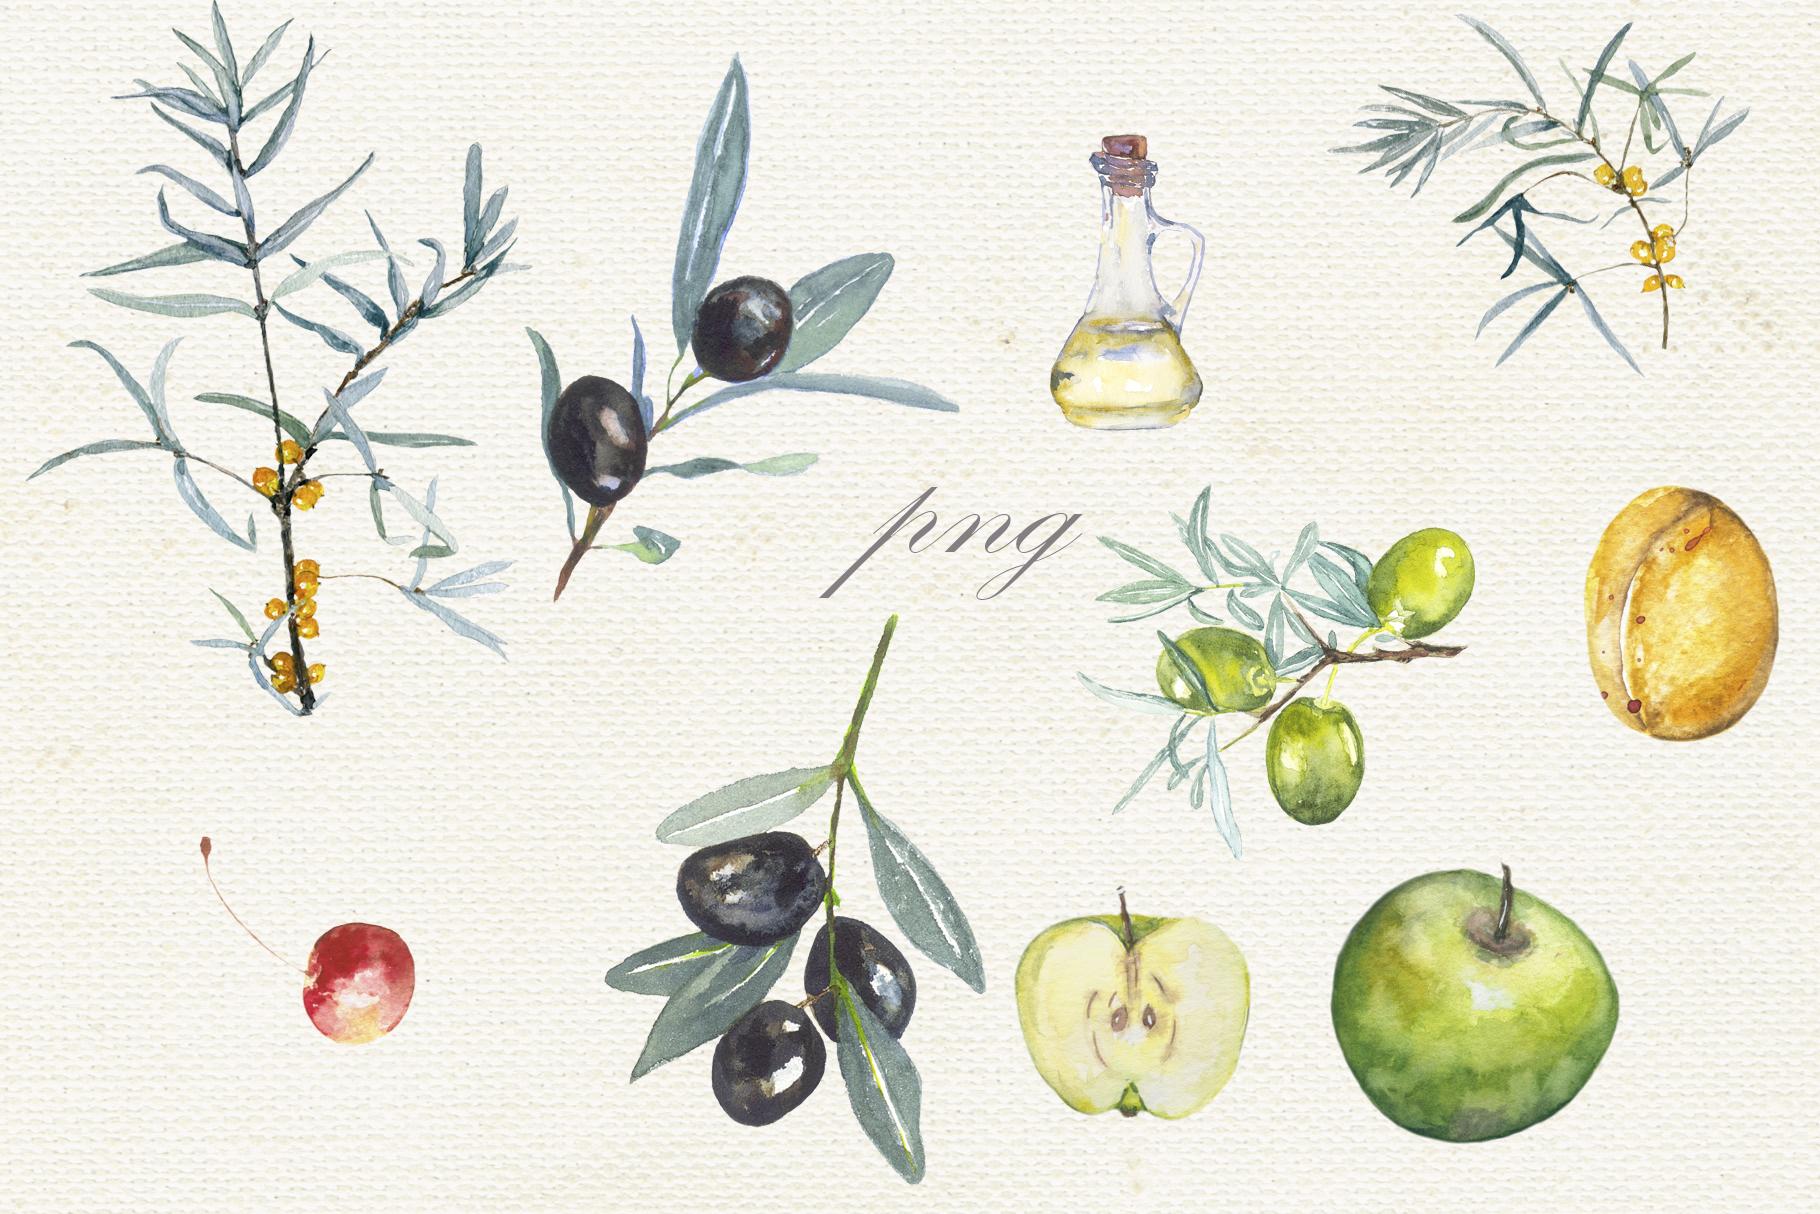 Fruit vegetables food watercolor example image 4